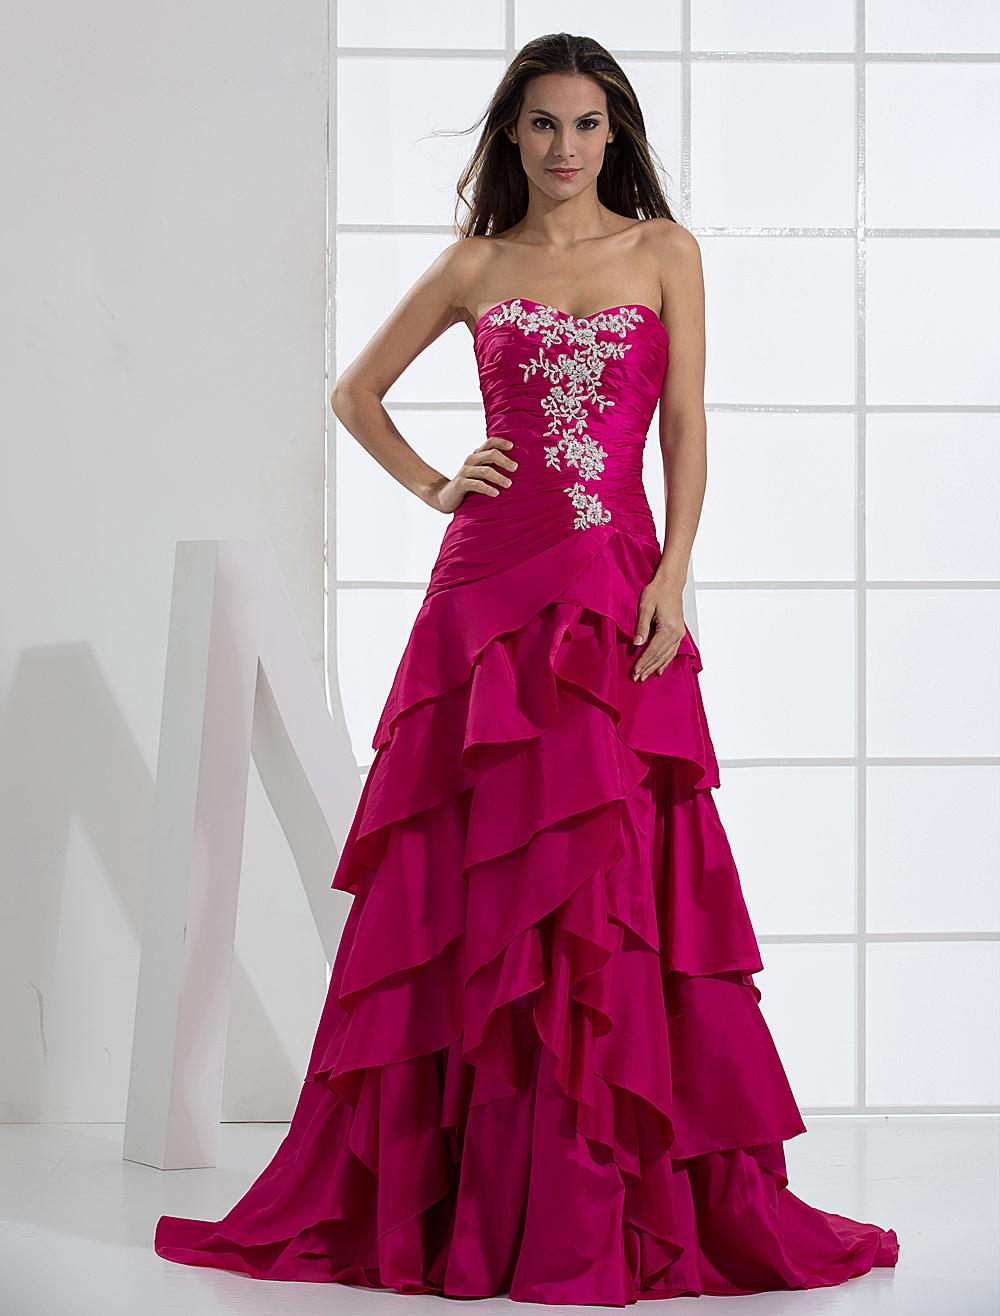 Taffeta Prom Dress with Sweetheart Neck Applique